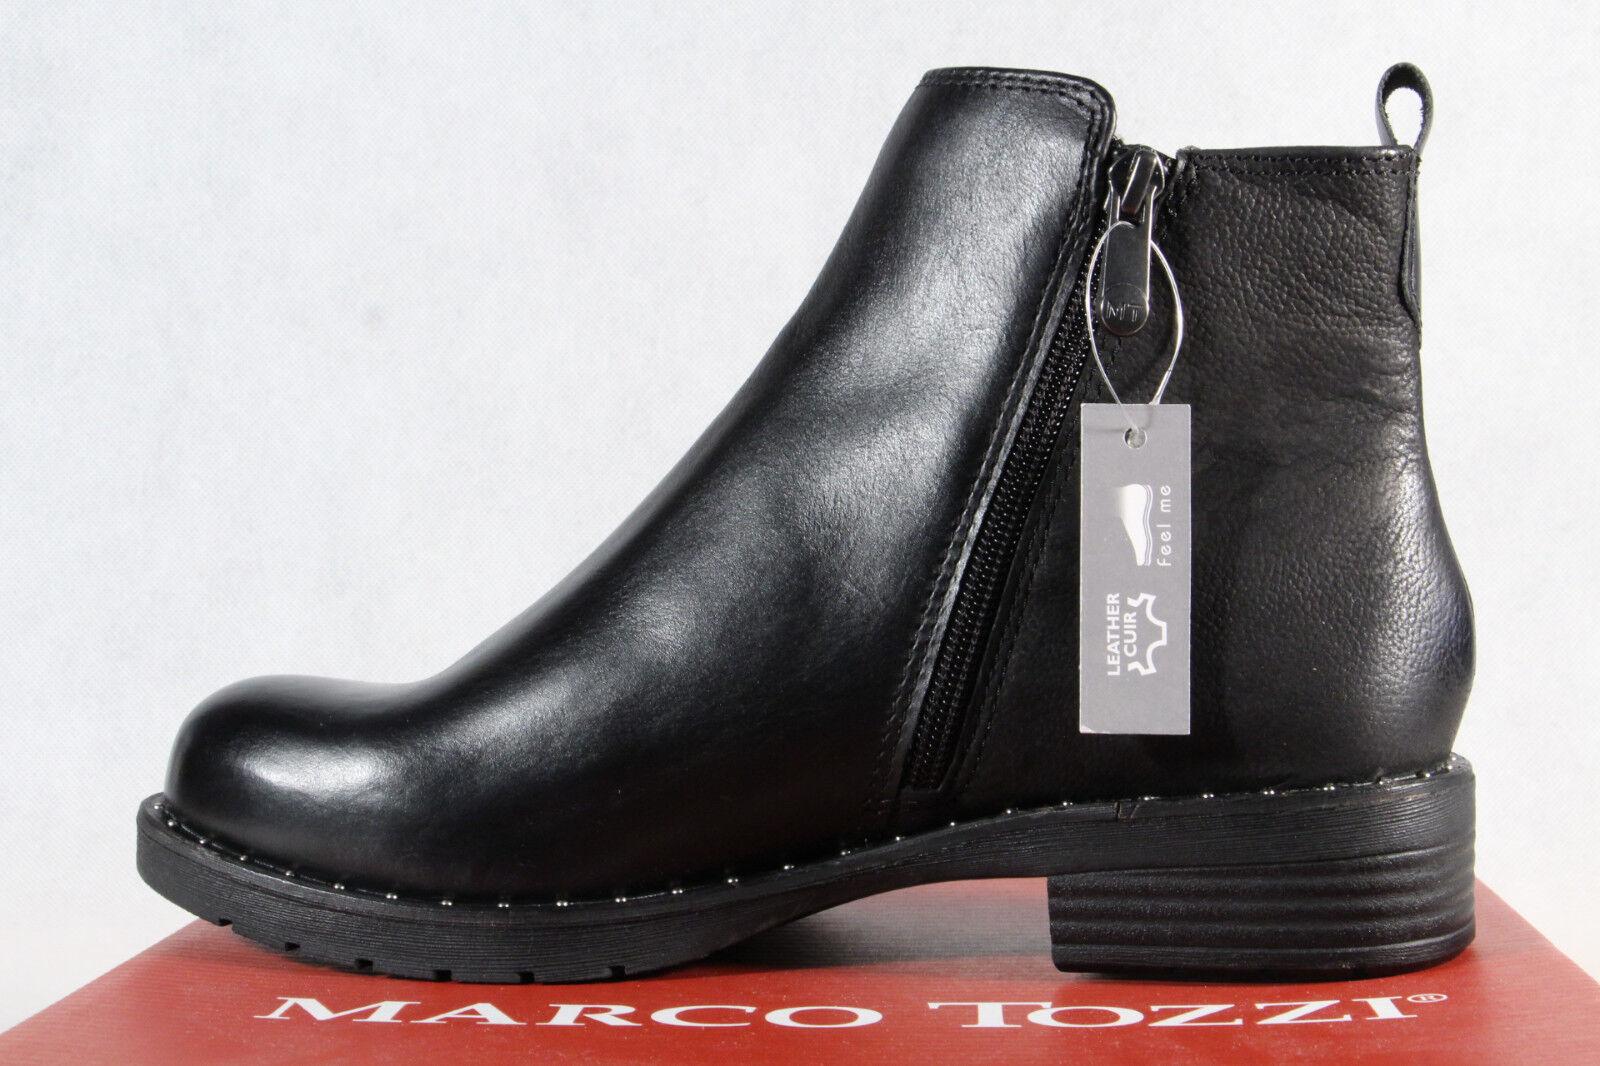 Marco Tozzi Femme Bottines Bottes D'Hiver Boot Bottes Neuf Noir 25437 Neuf Bottes 9c92a0